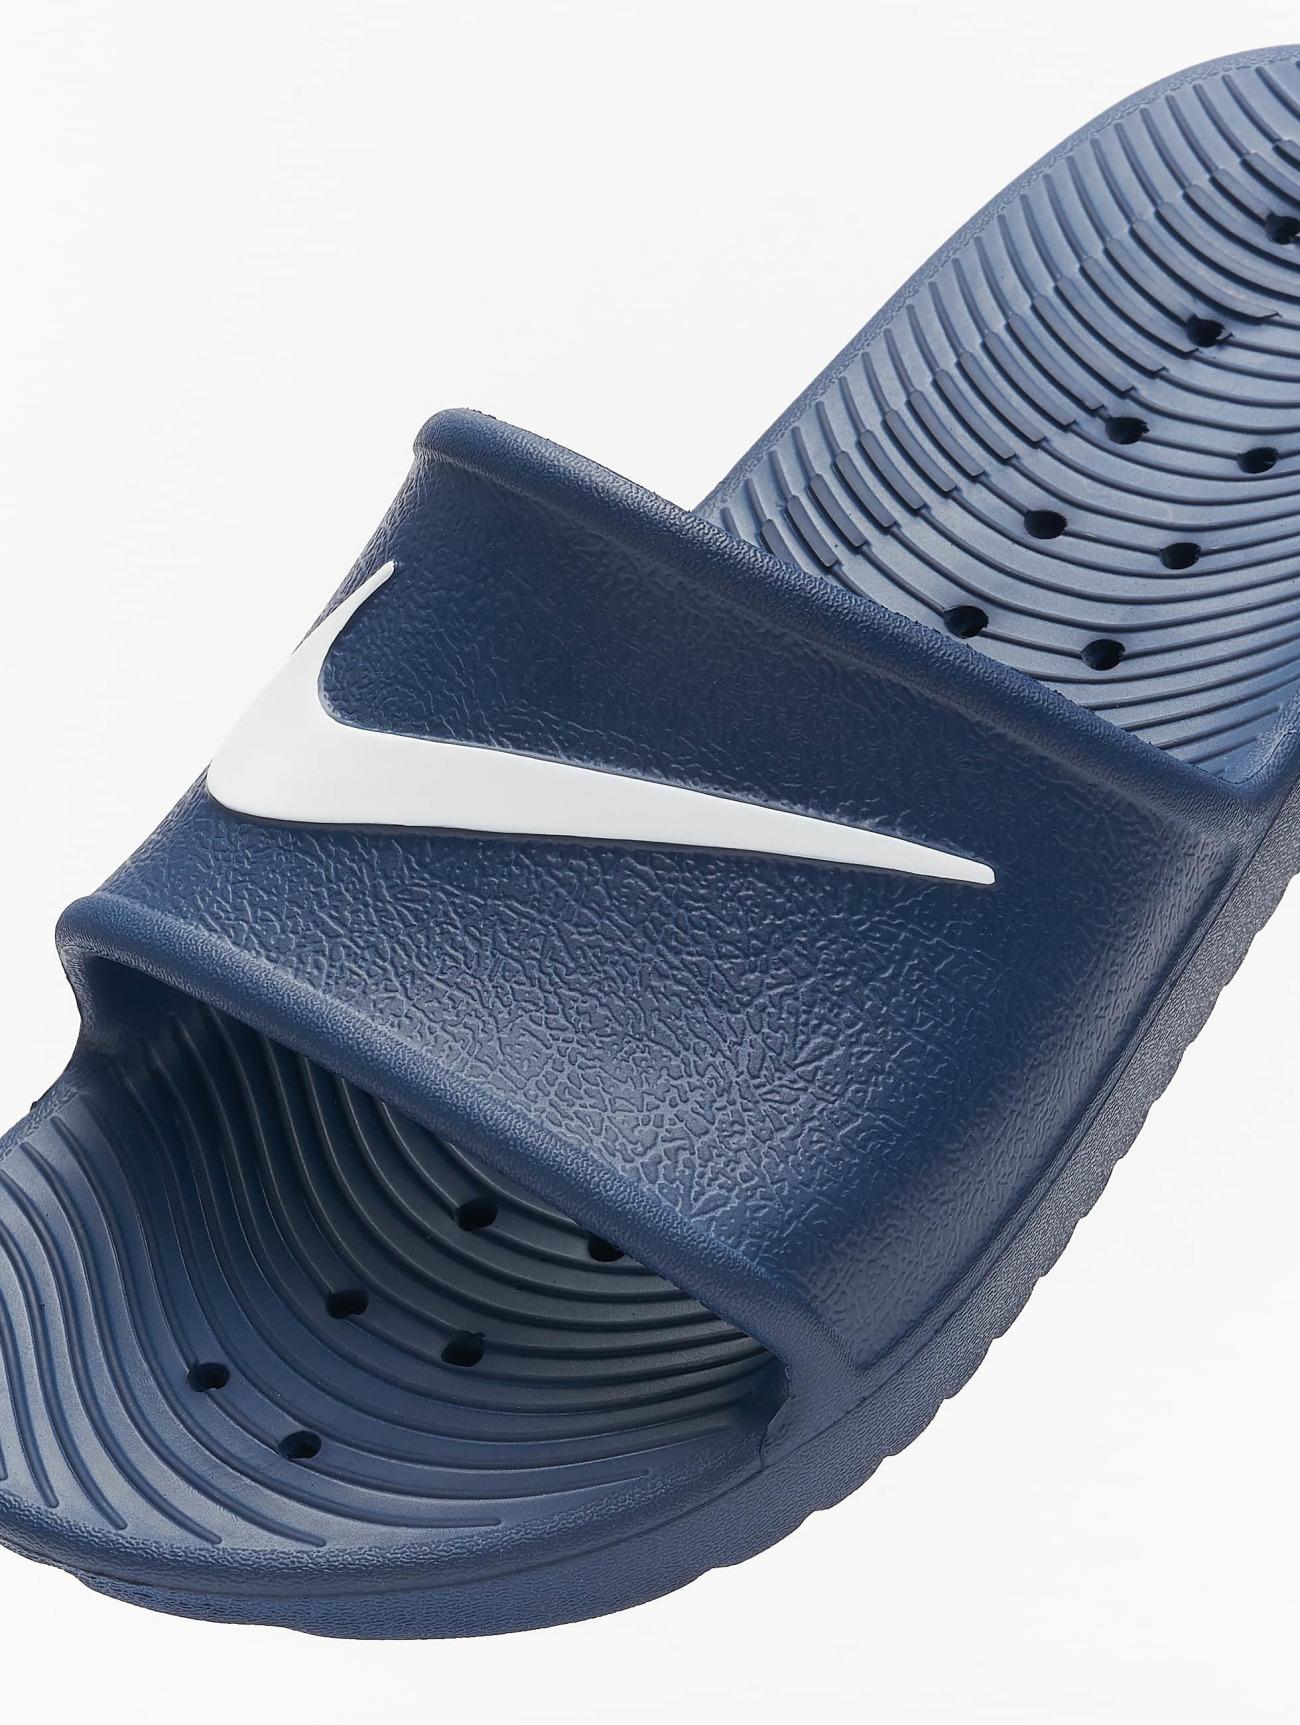 Nike  Kawa Shower Slide  bleu Homme Claquettes & Sandales  422216 Homme Chaussures